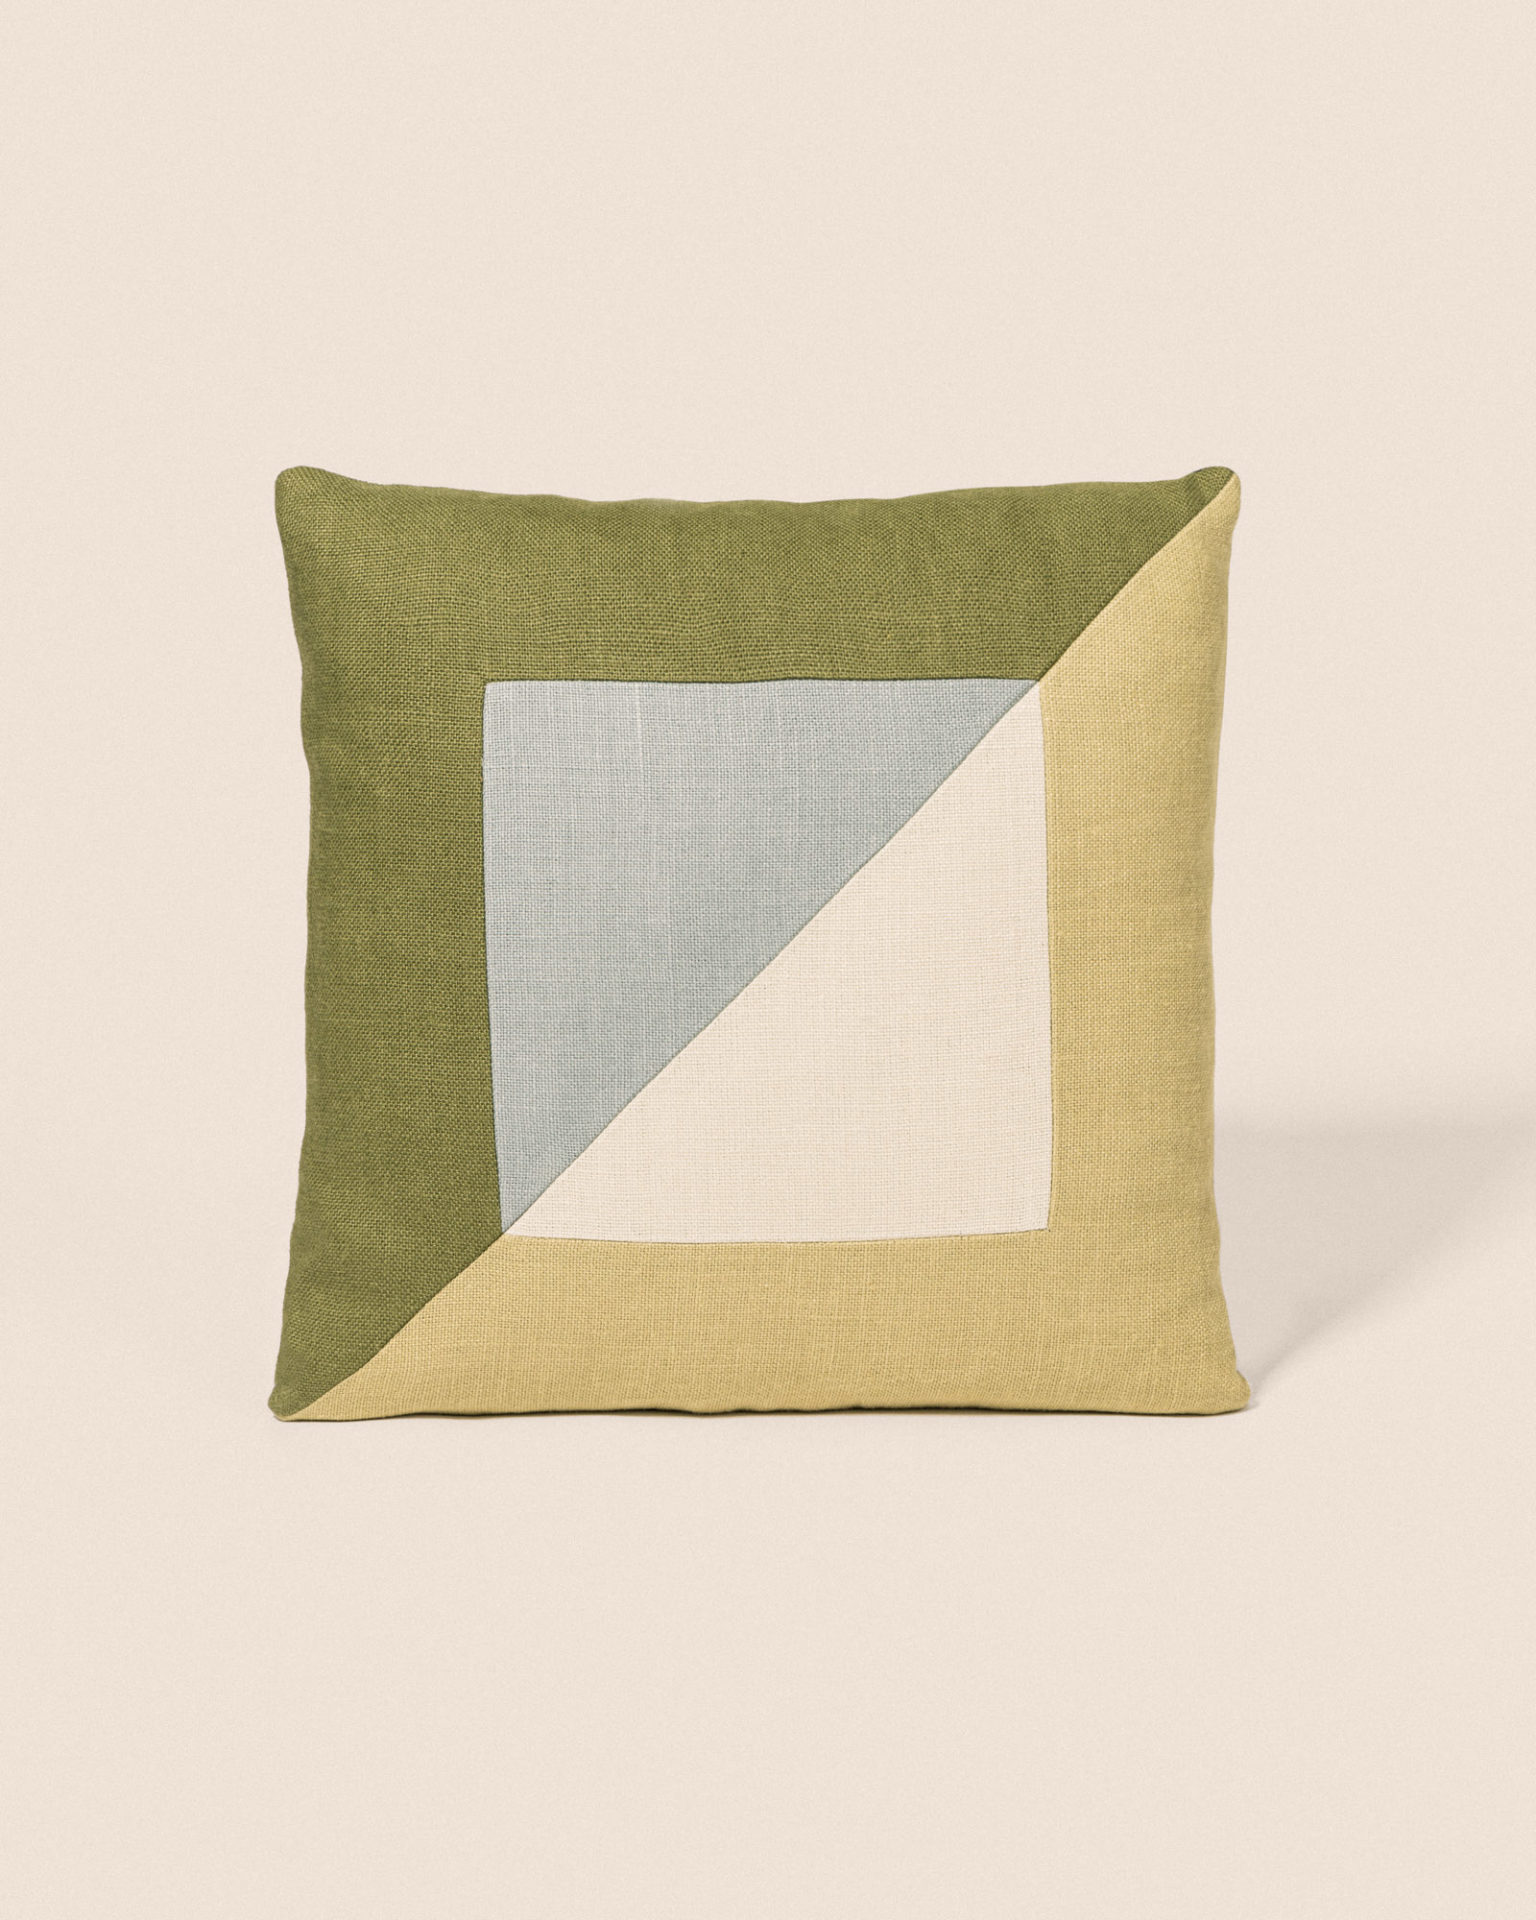 Coussin Diagonal - Ciel & Olive